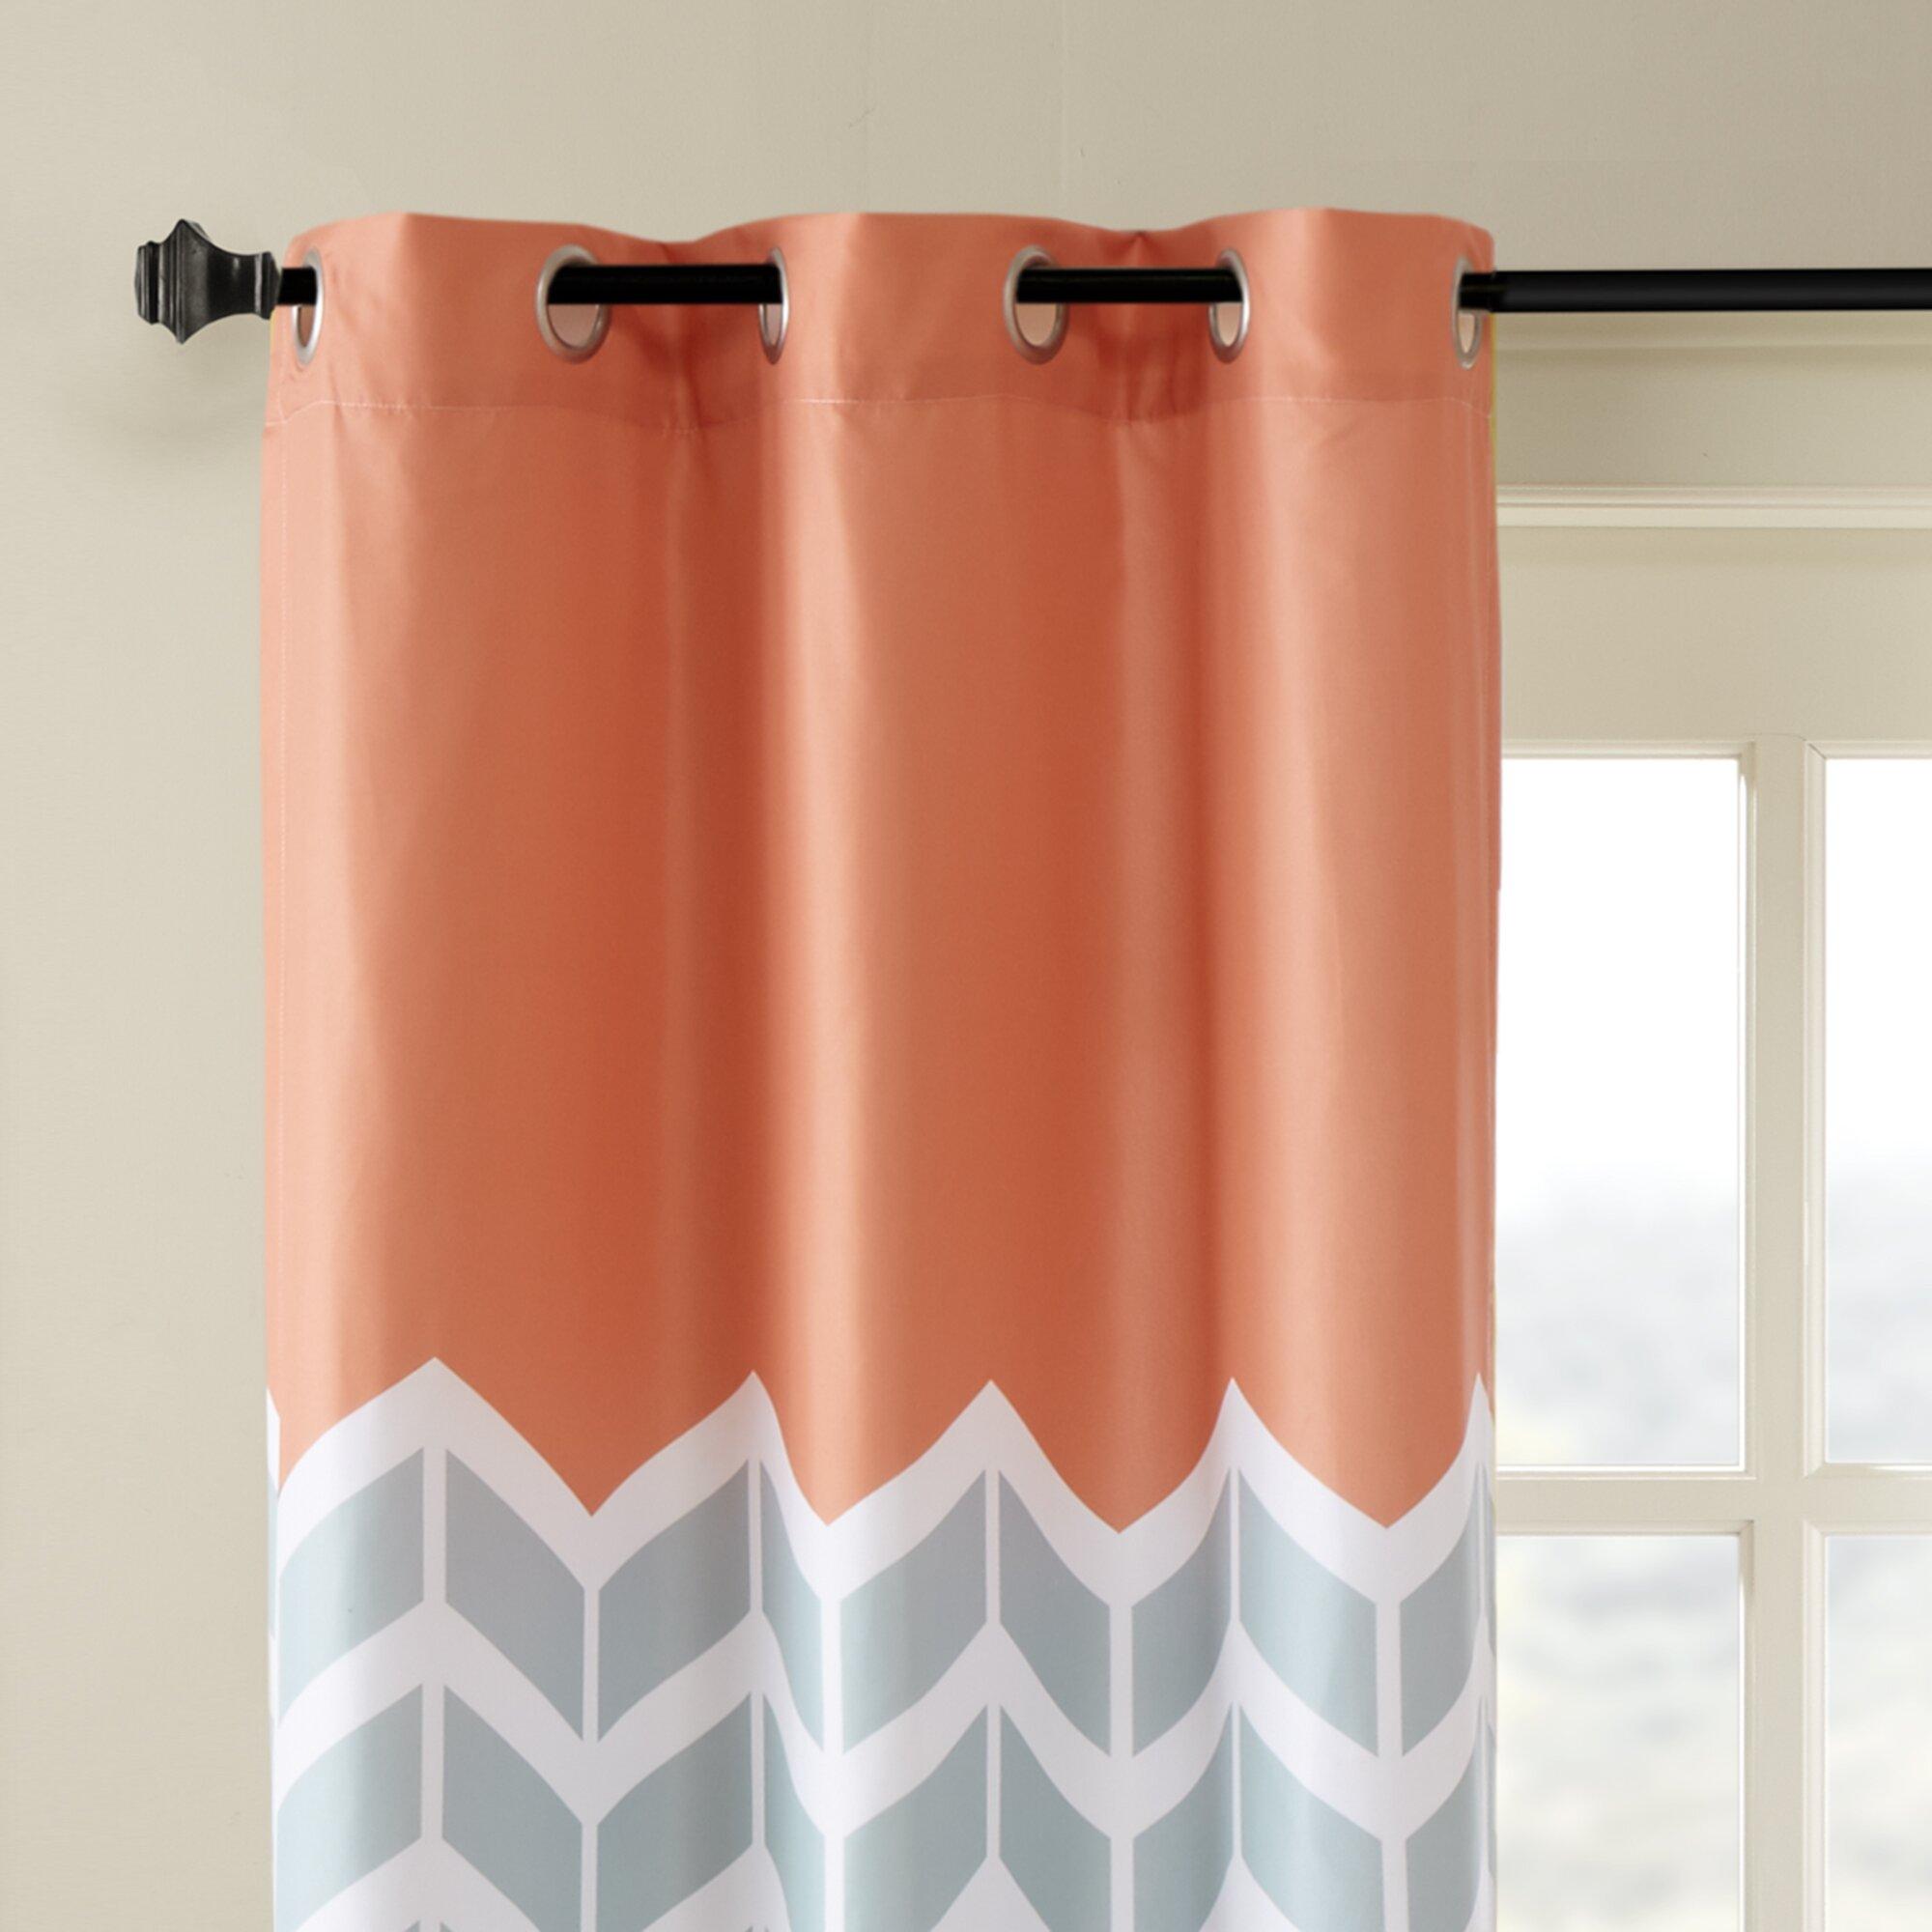 Intelligent Design Alex Chevron Semi Sheer Curtain Panels